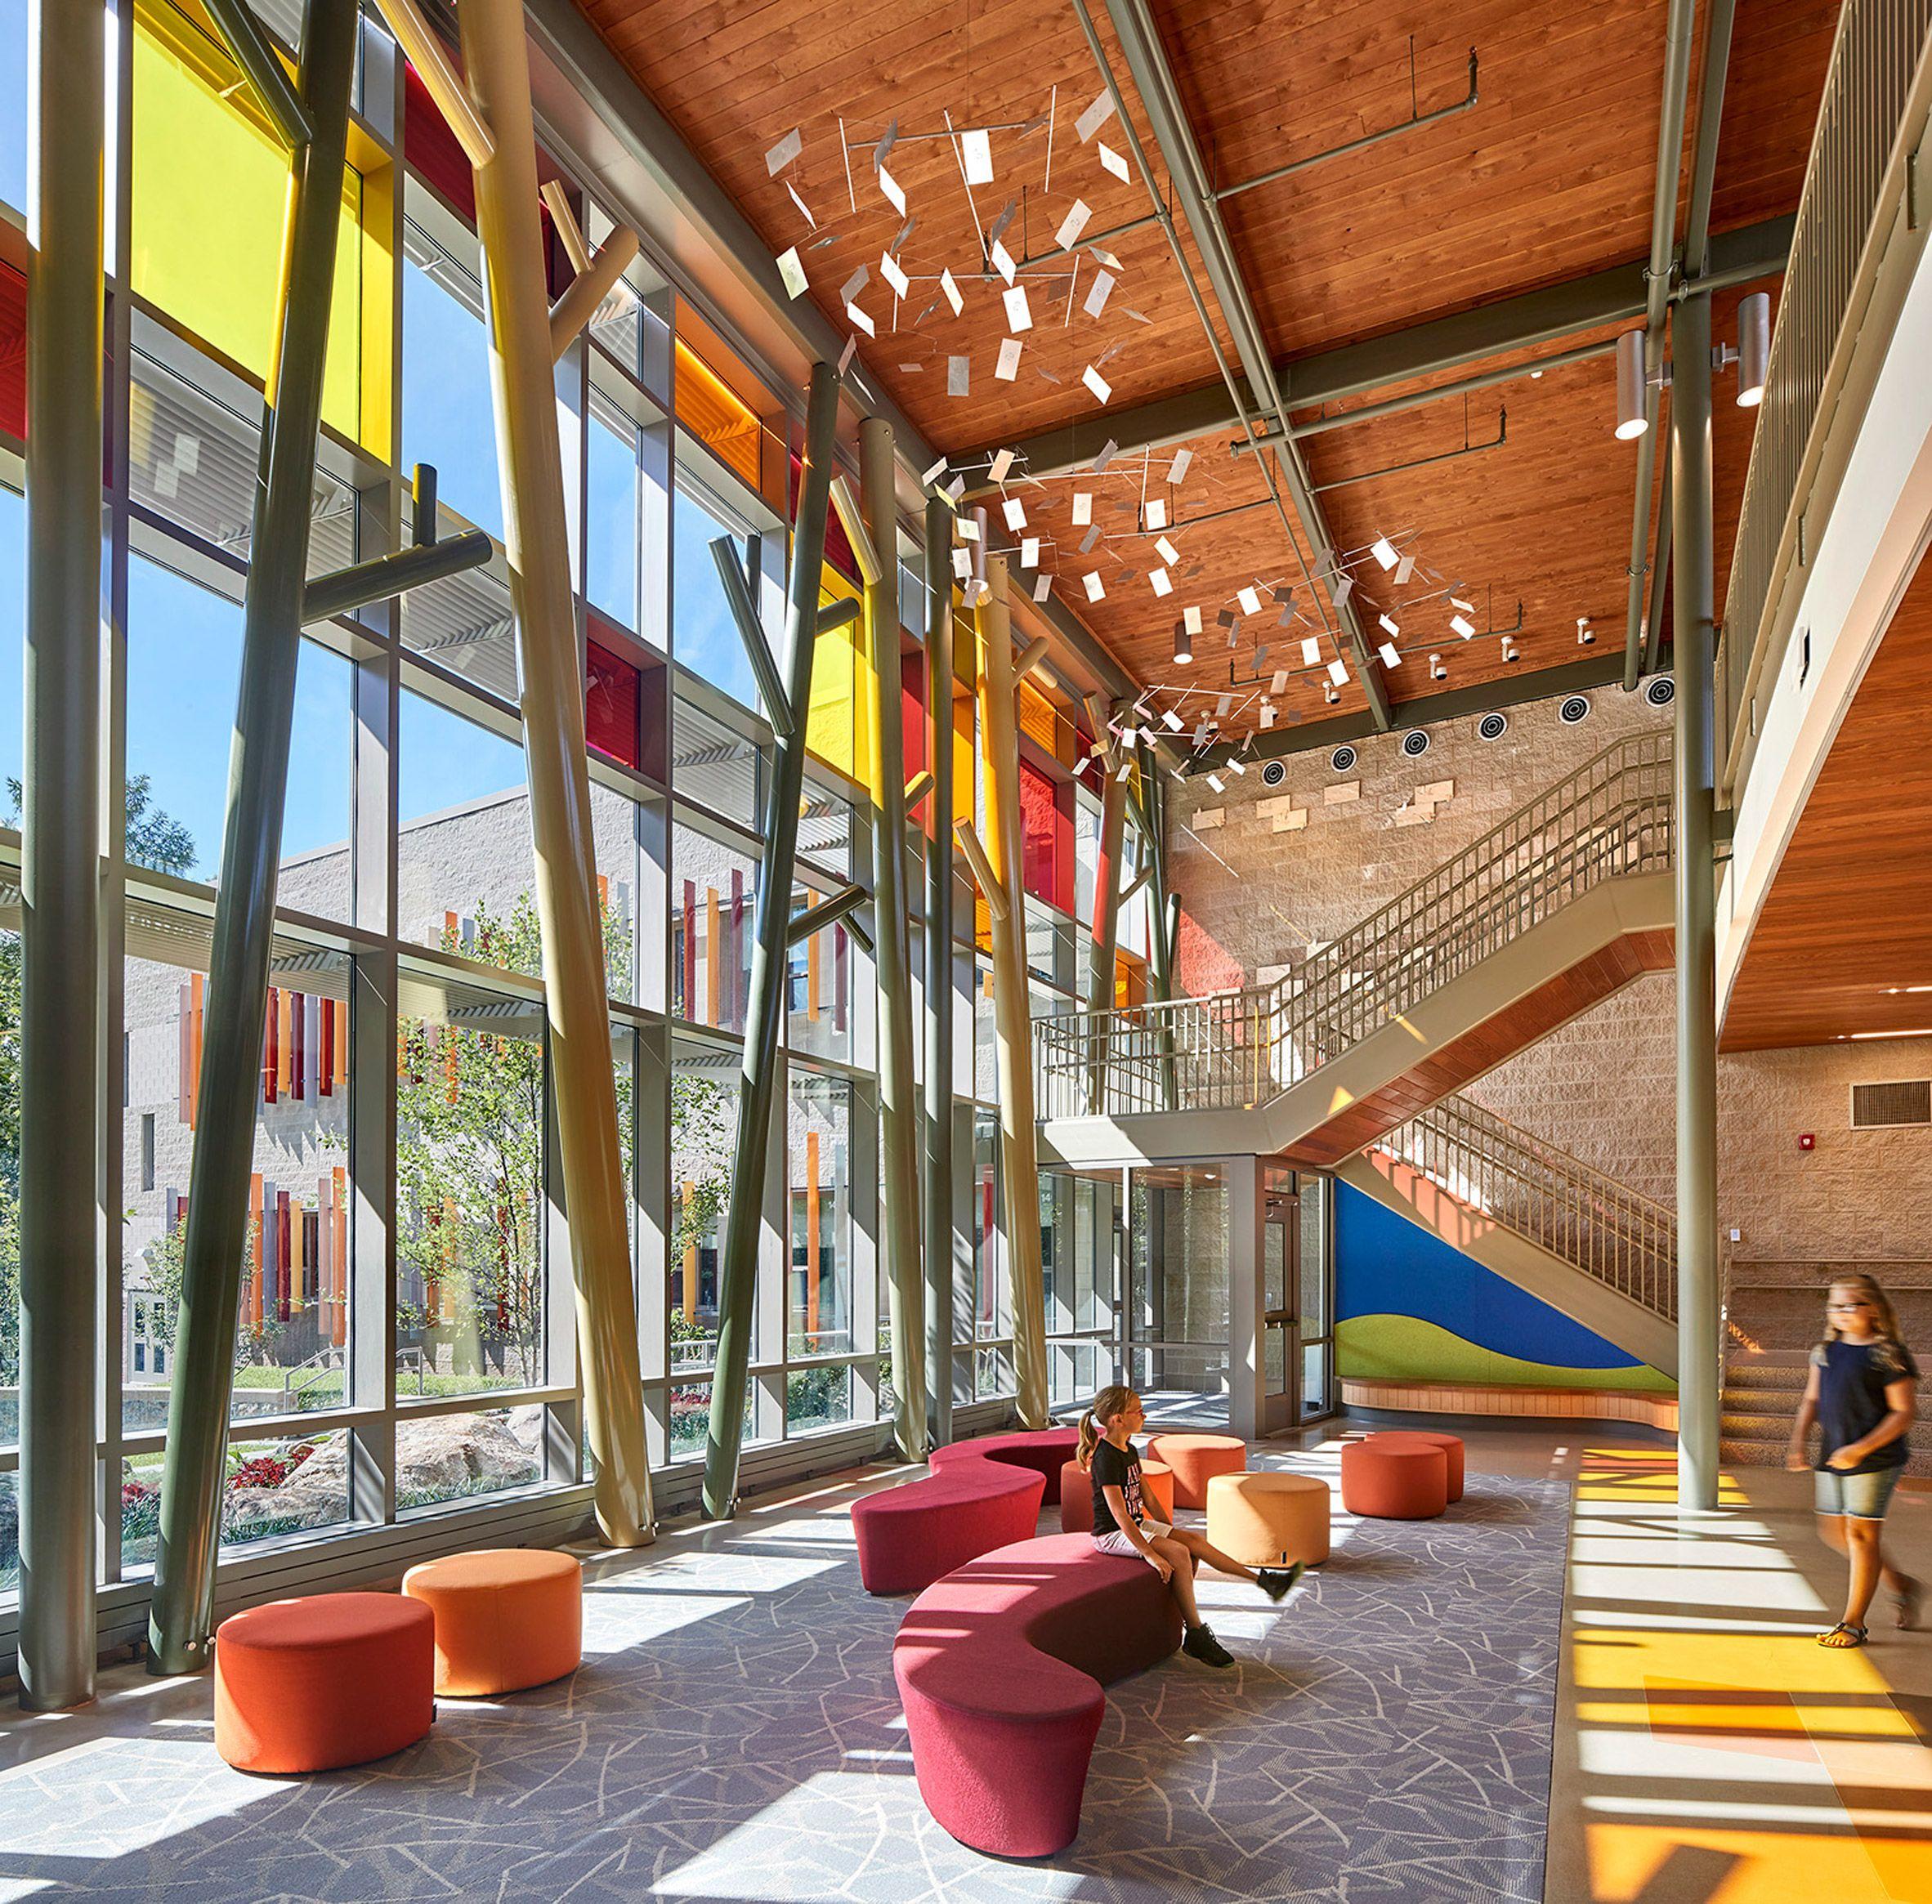 School Interior Design: Sandy Hook Elementary School In Connecticut, USA By Svegal